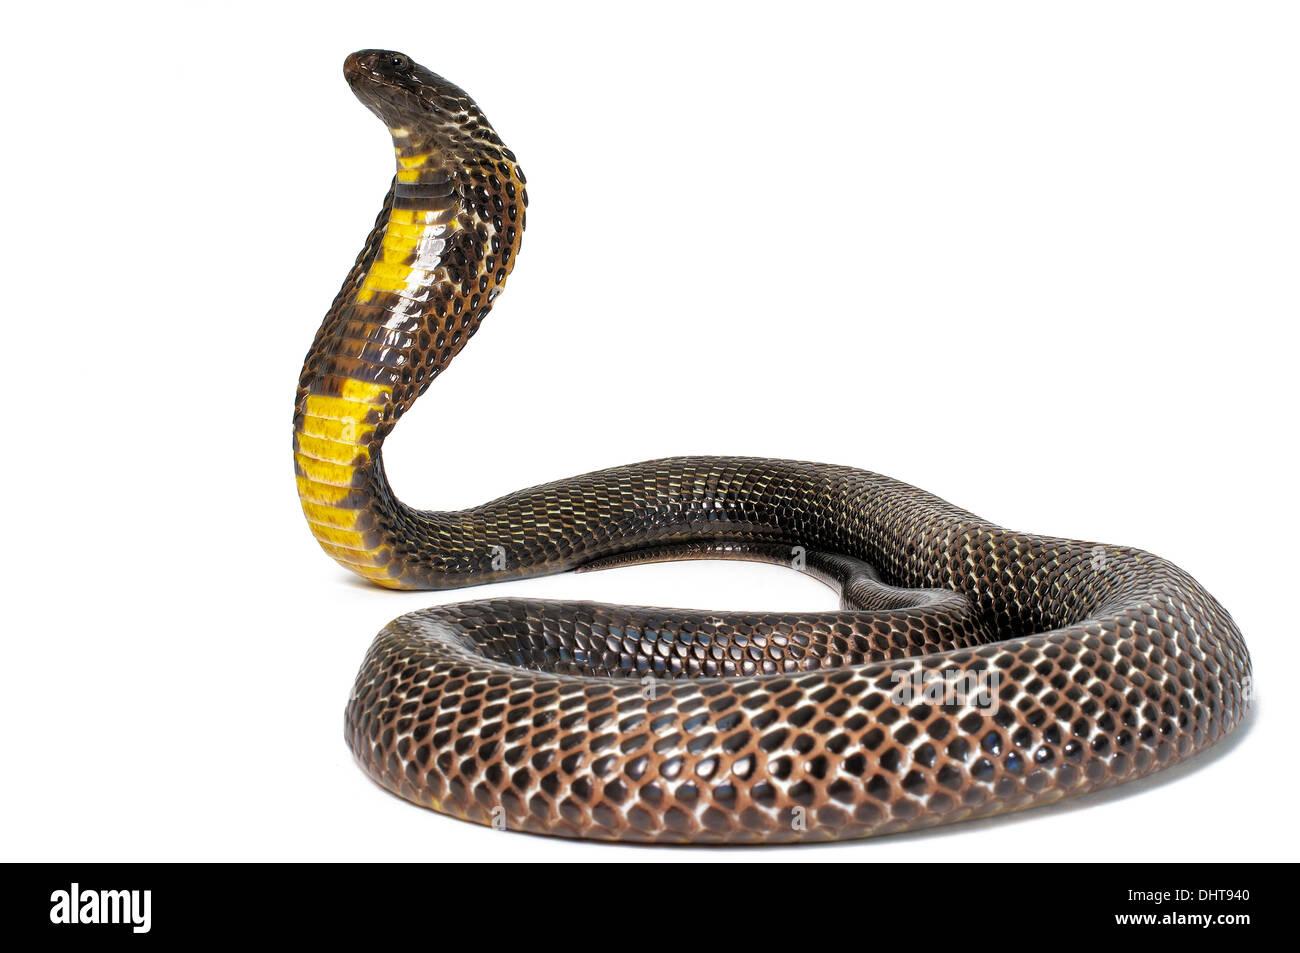 Cobra pakistaní en negro sobre fondo blanco. Imagen De Stock